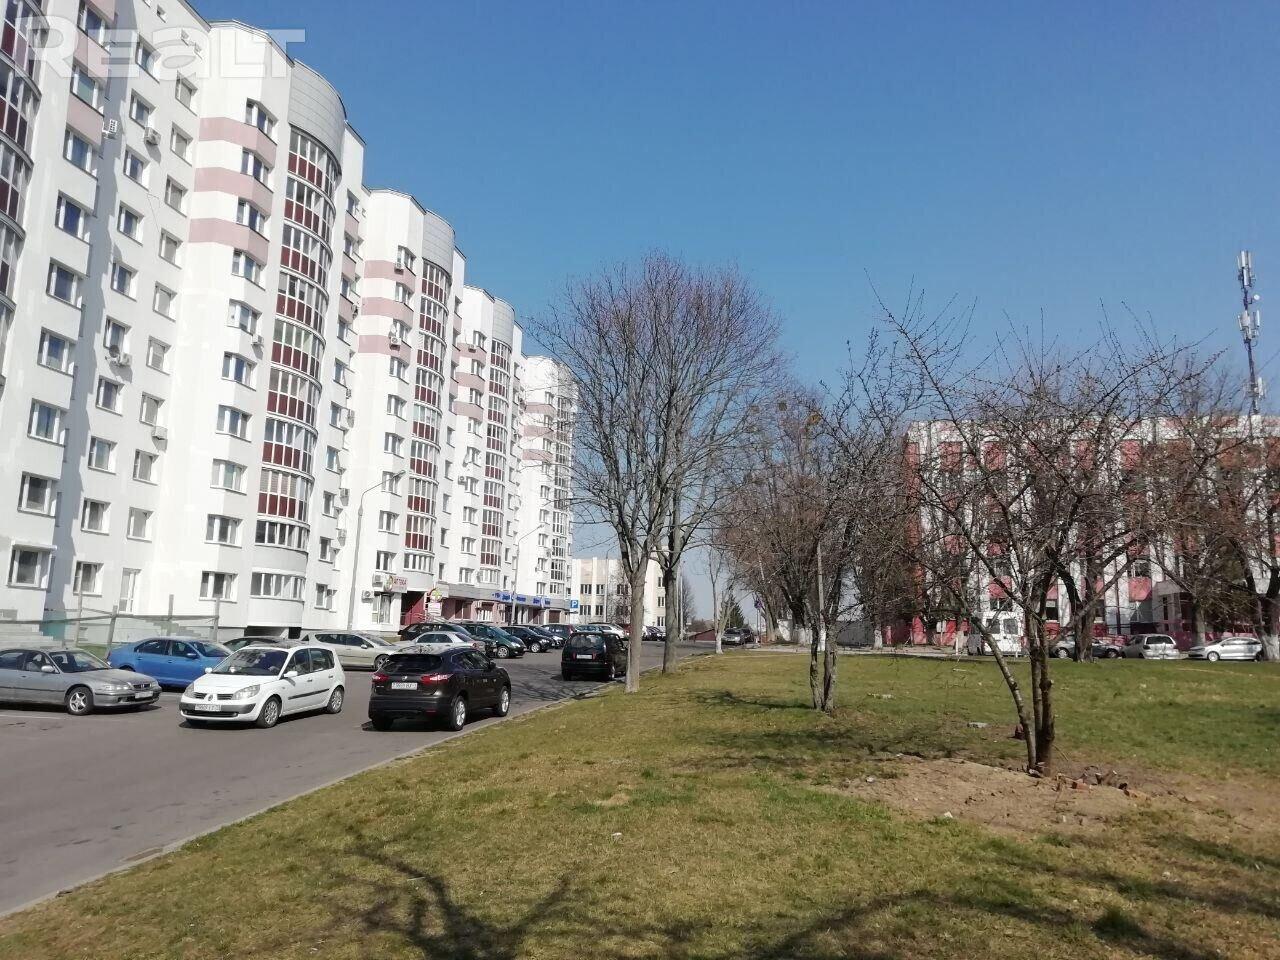 Продажа 3-х комнатной квартиры в г. Гомеле, ул. Ландышева, дом 12 (р-н Старый аэродром). Цена 156 013 руб c торгом